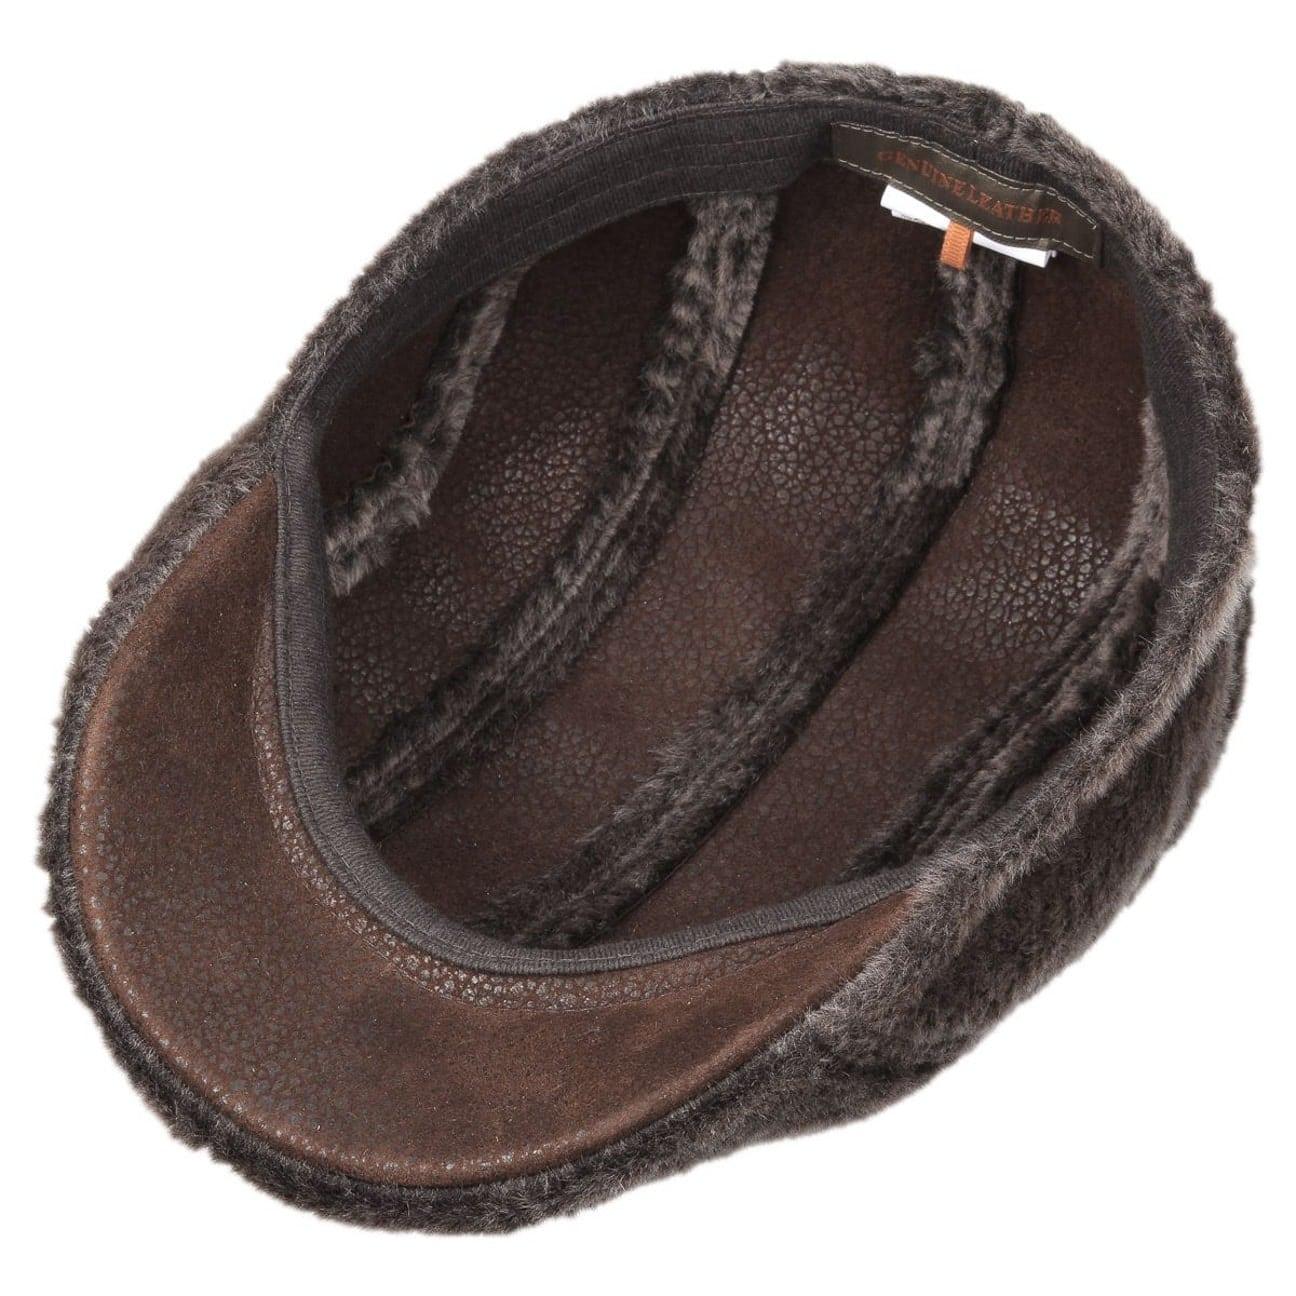 ... Madison Lamb Fur Flat Cap by Stetson - brown 3 ... 1d4488a3f45c